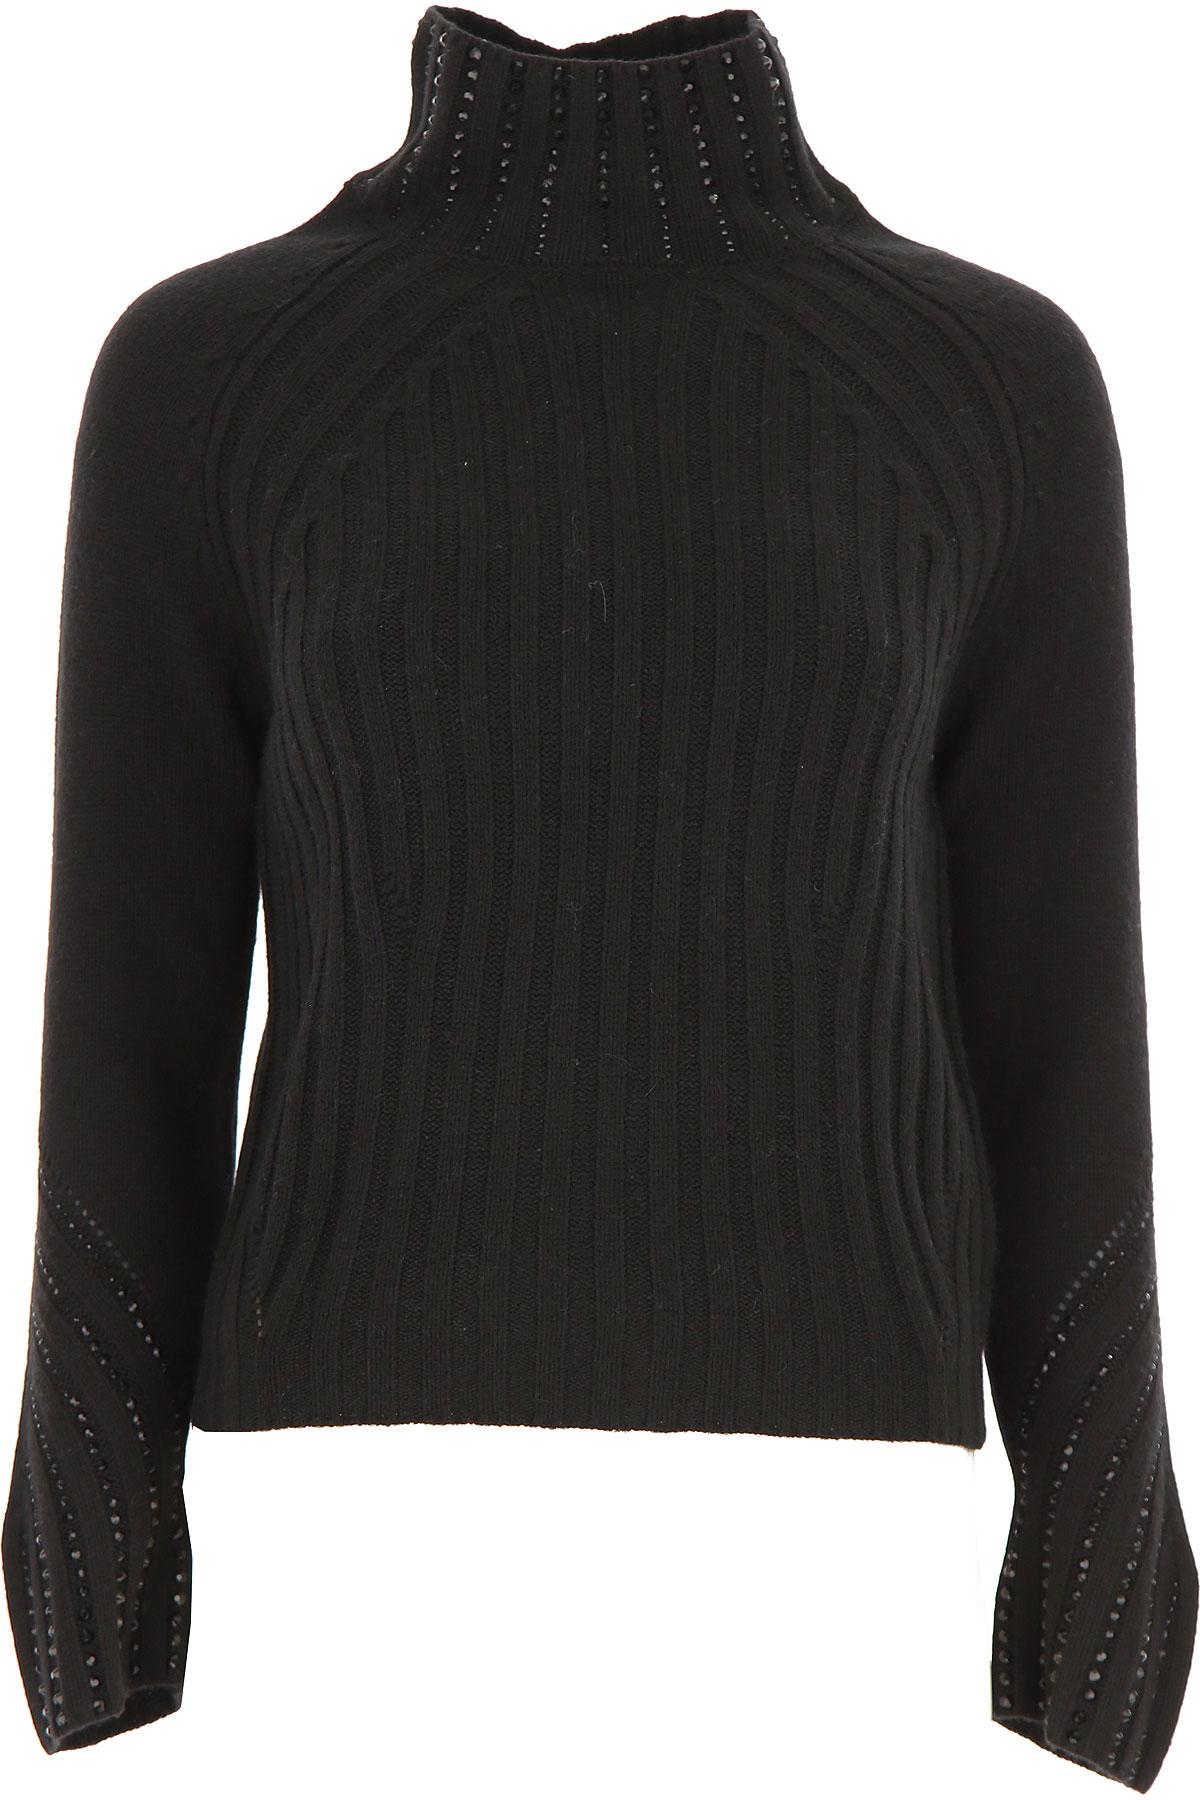 Ermanno Scervino Sweater for Women Jumper On Sale, Black, Viscose, 2019, 4 8